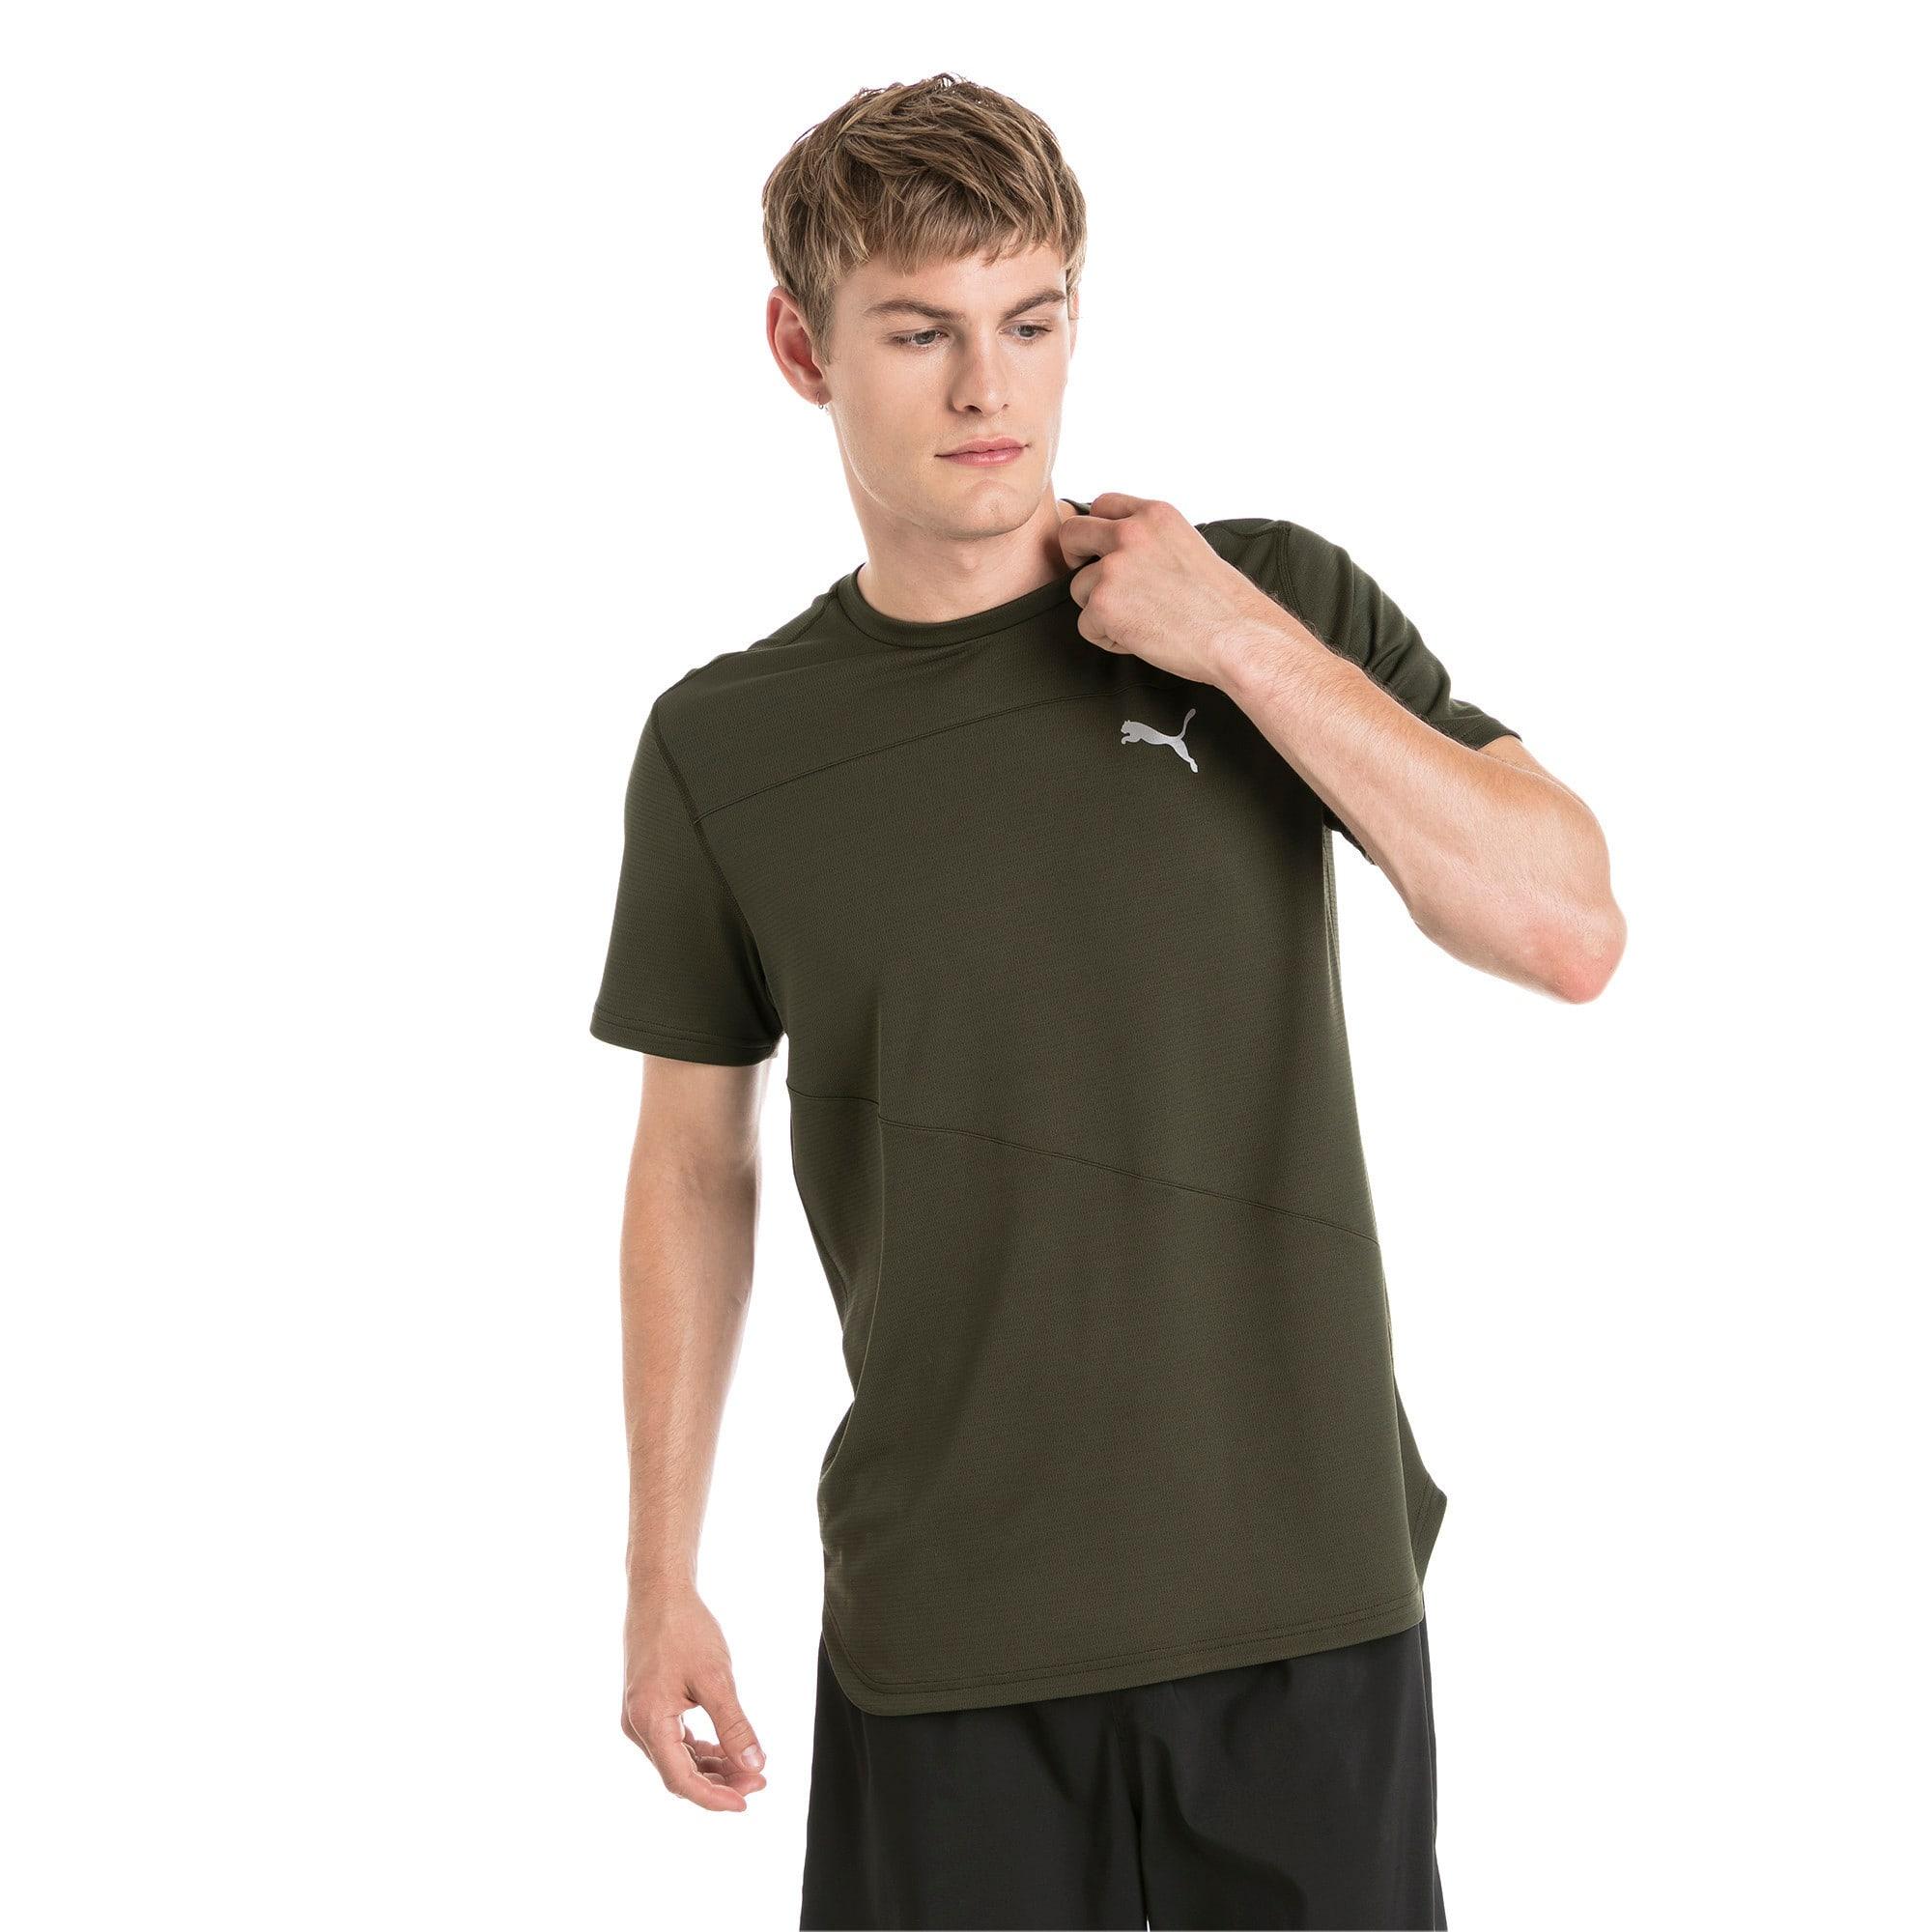 Thumbnail 1 of Running Men's IGNITE Mono T-Shirt, Forest Night, medium-IND